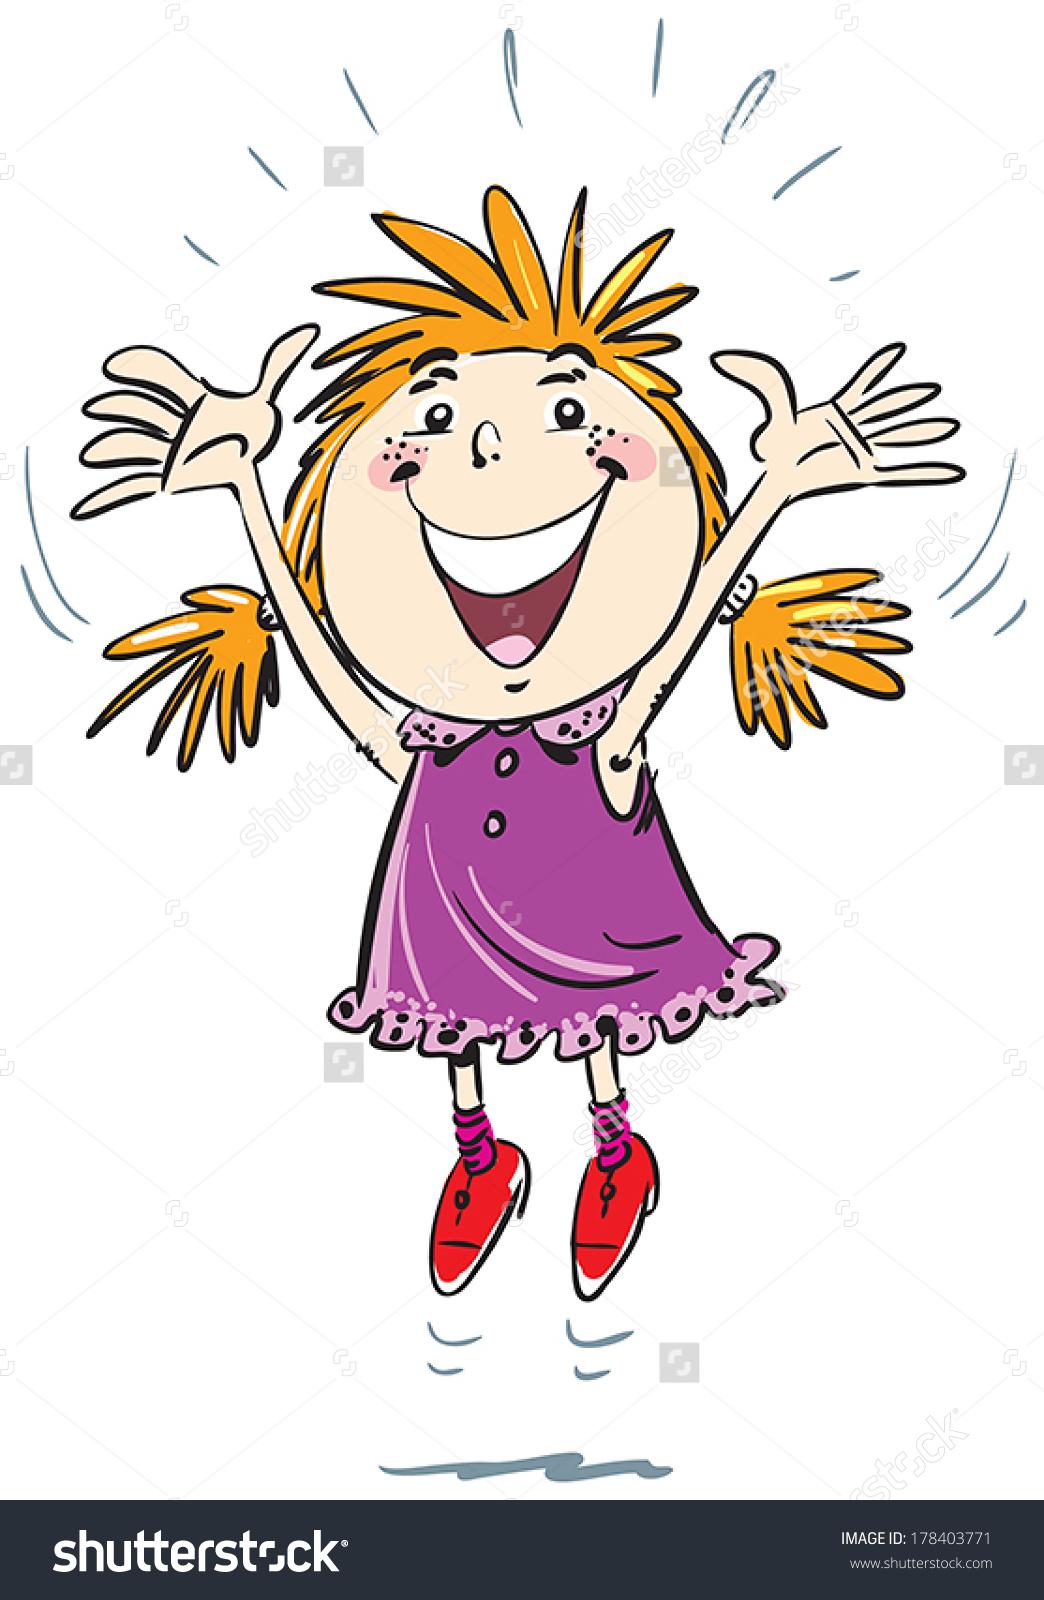 Joy clipart hop. Free girl jump cliparts